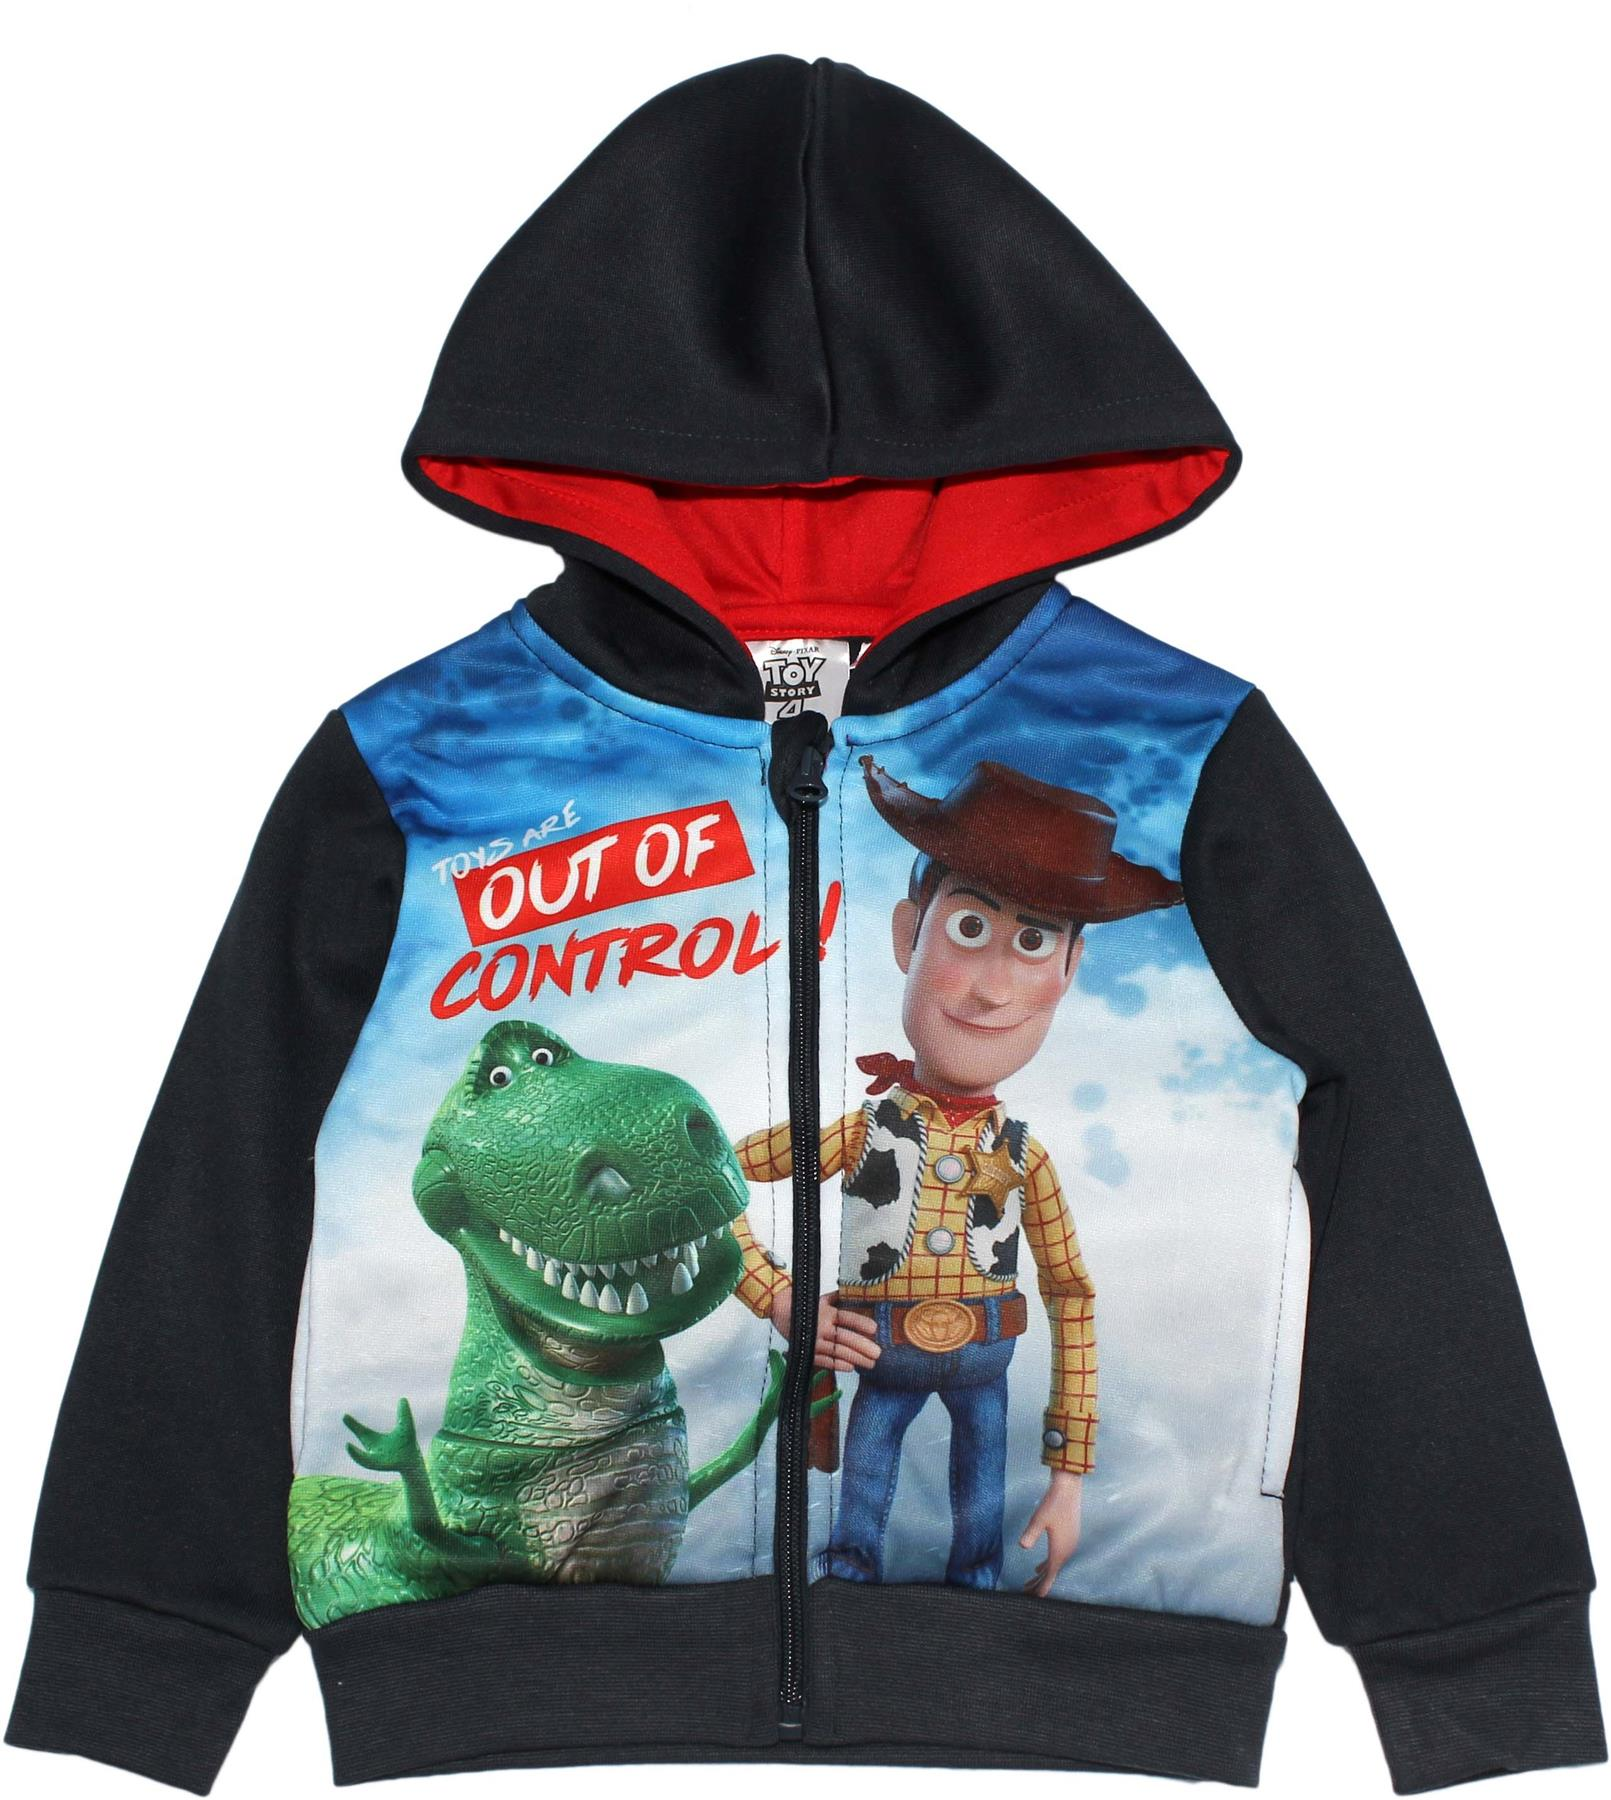 New Toy Story Buzz Lightyear Jacket Hooded Sweatshirt Casual Coat Zipper Hoodie